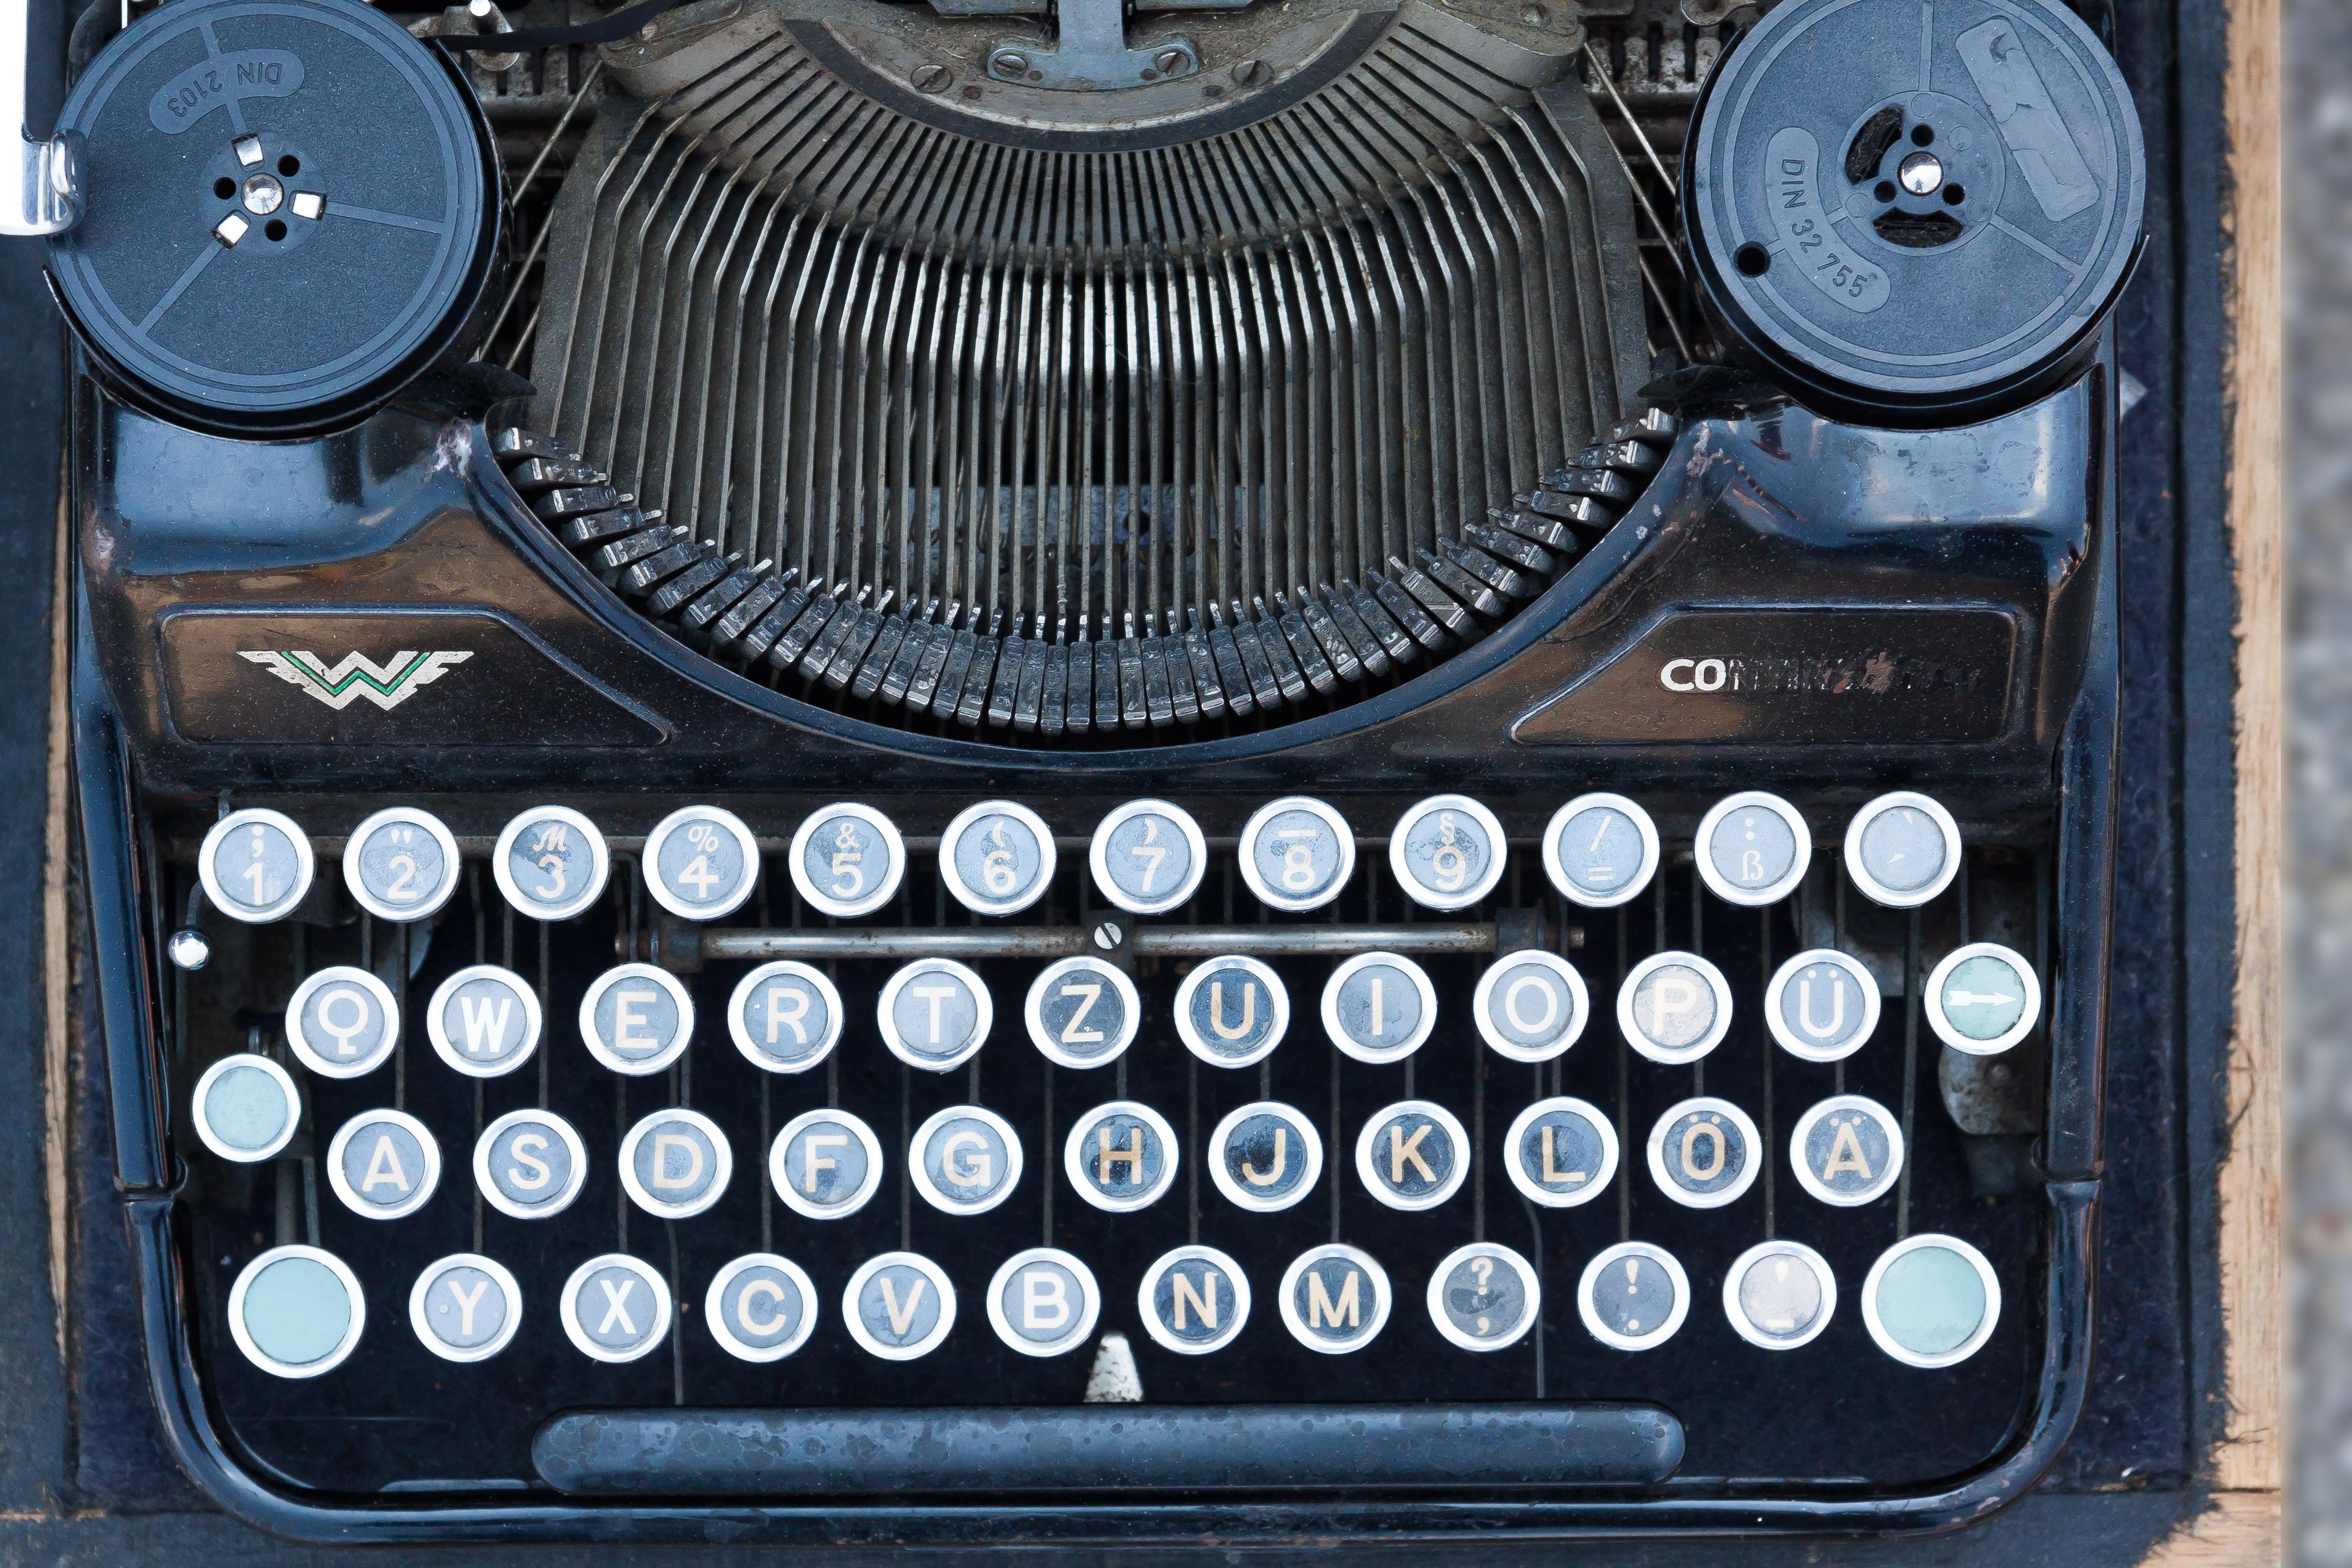 Gambar Kata Keyboard Antik Retro Tua Mesin Tik Alfabet